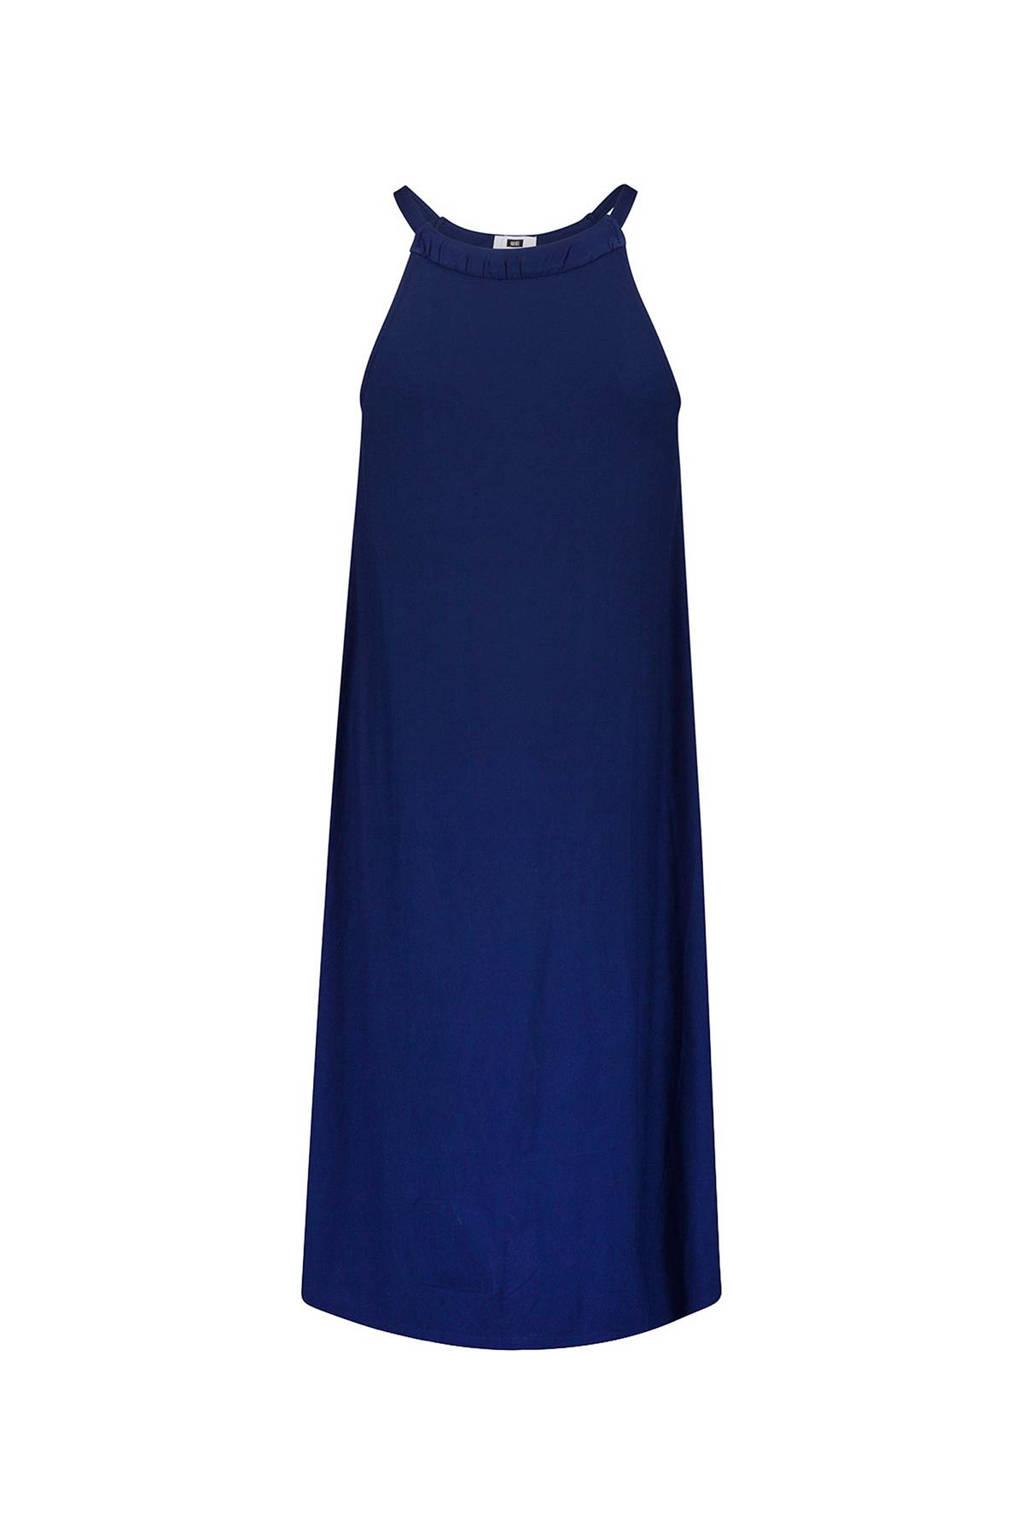 WE Fashion jurk donkerblauw, Donkerblauw